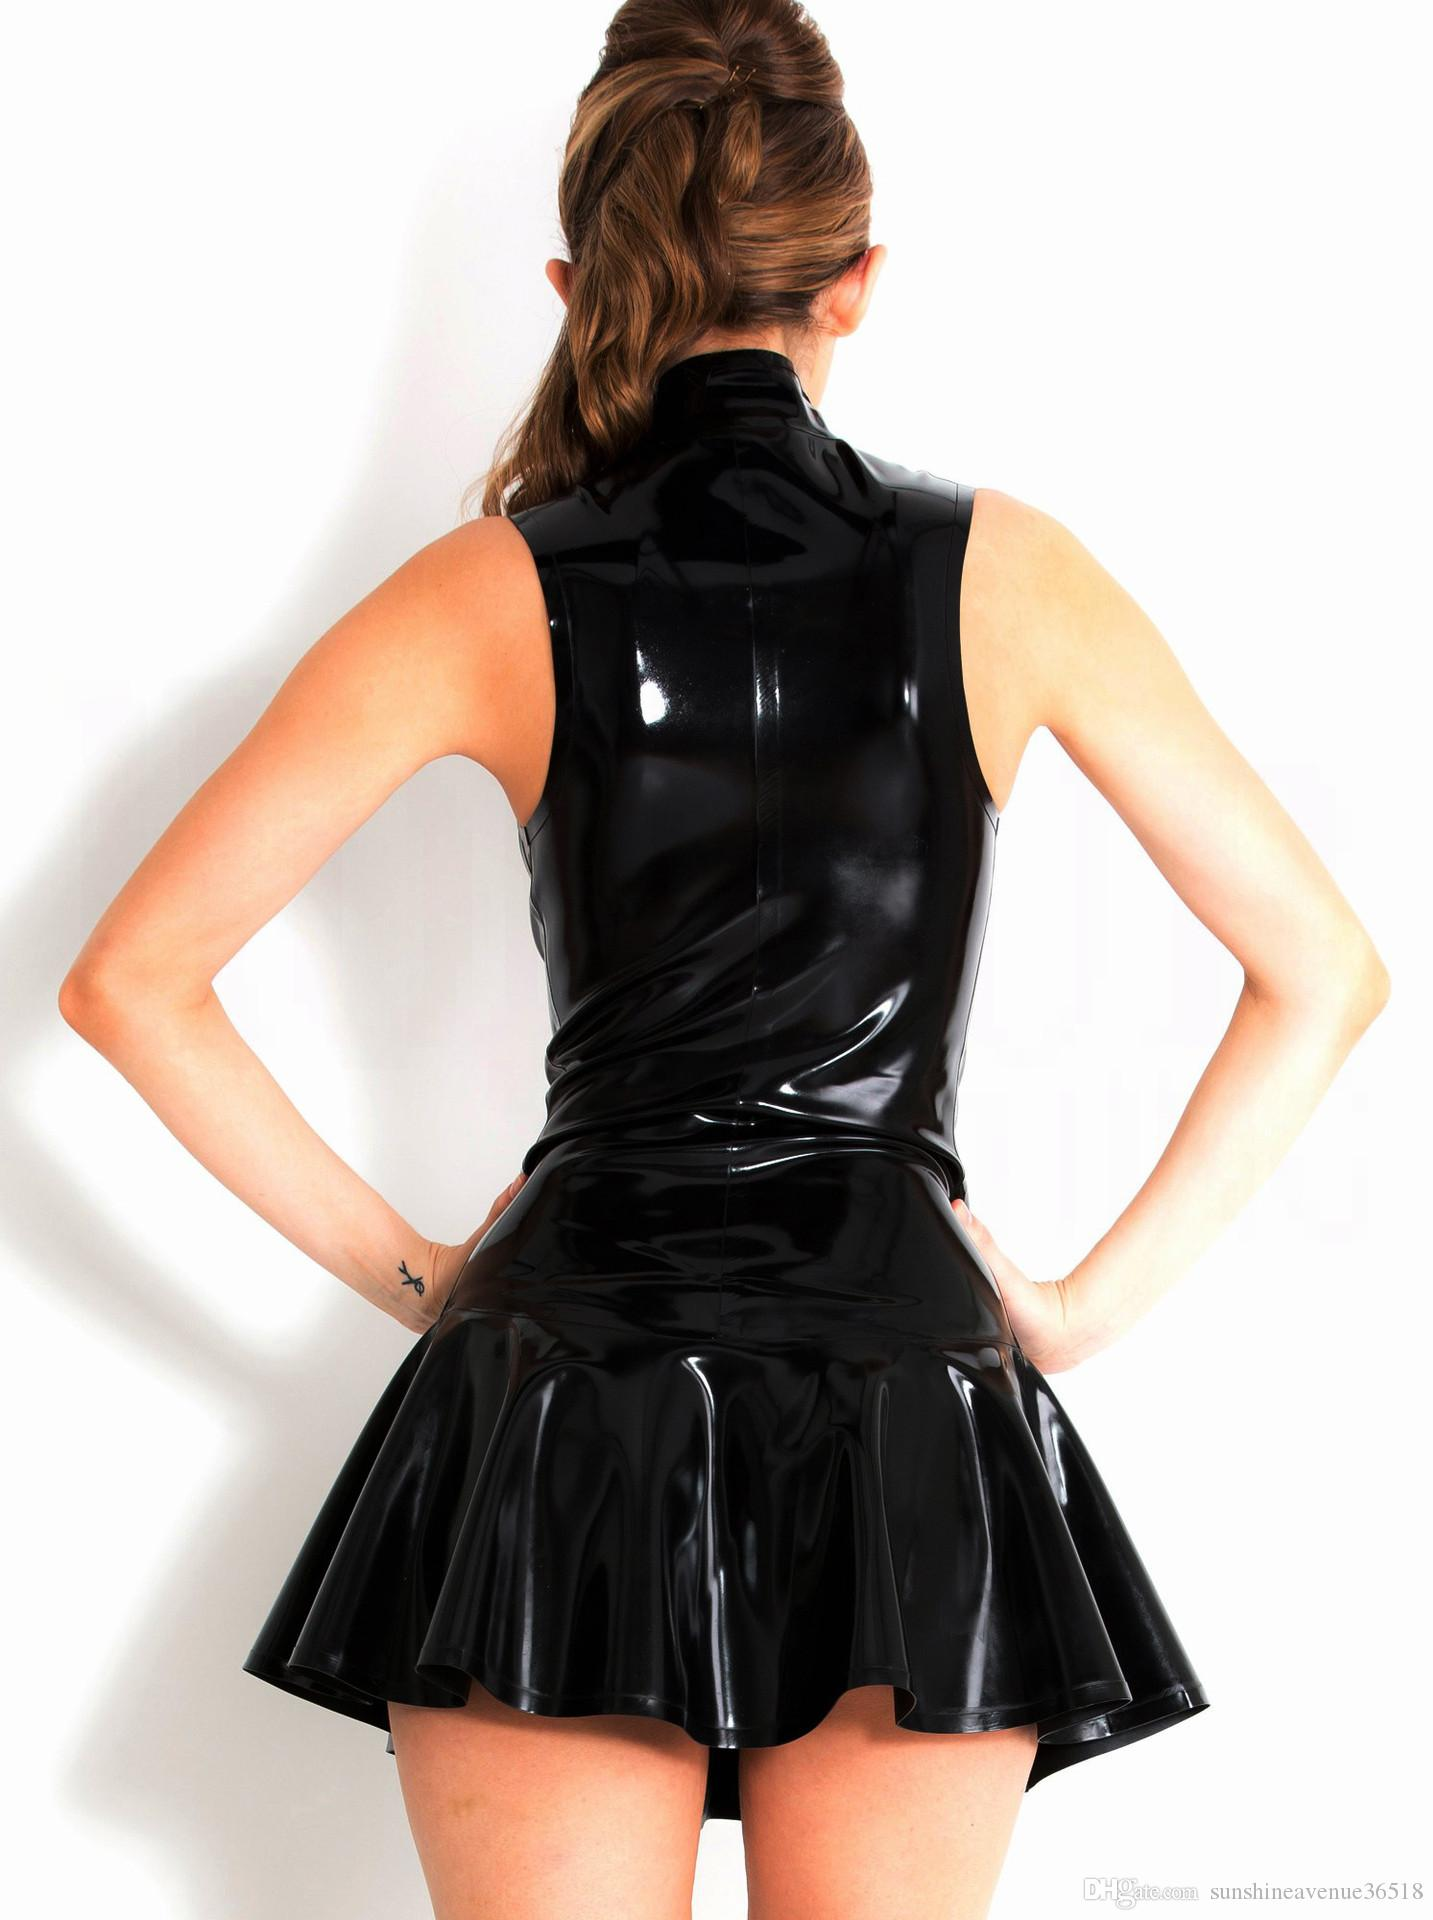 S-XXL plus size 2015 Women Hot Sexy Latex Bodycon Dress pvc sexy lingerie Catsuit Latex dresses Teddies costume